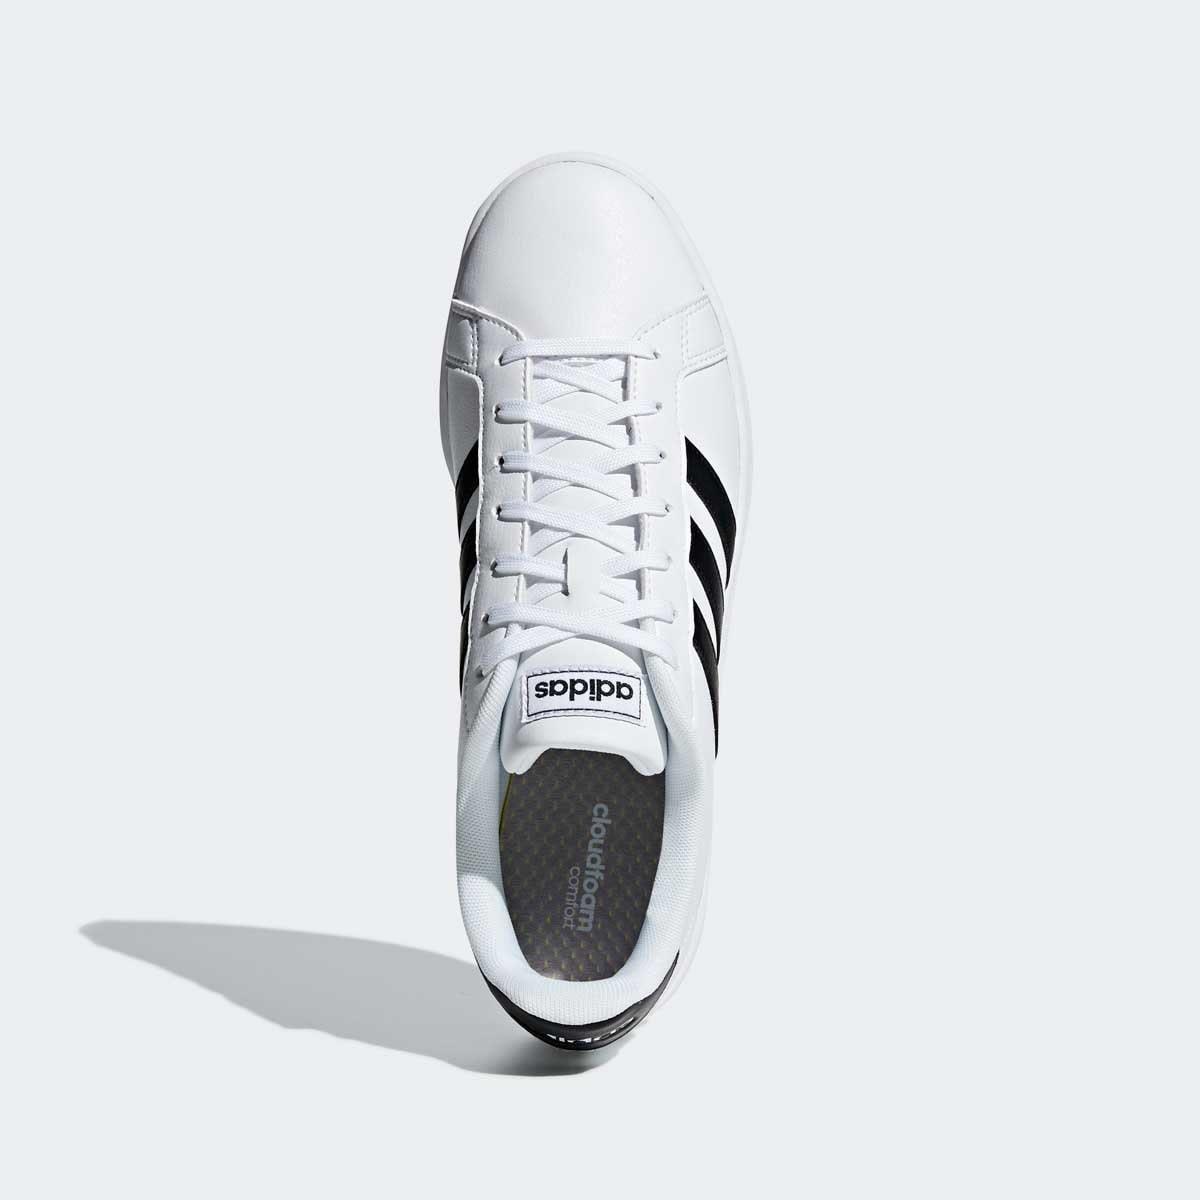 Tenis Casual Grand Court Blanco Adidas - Caballero